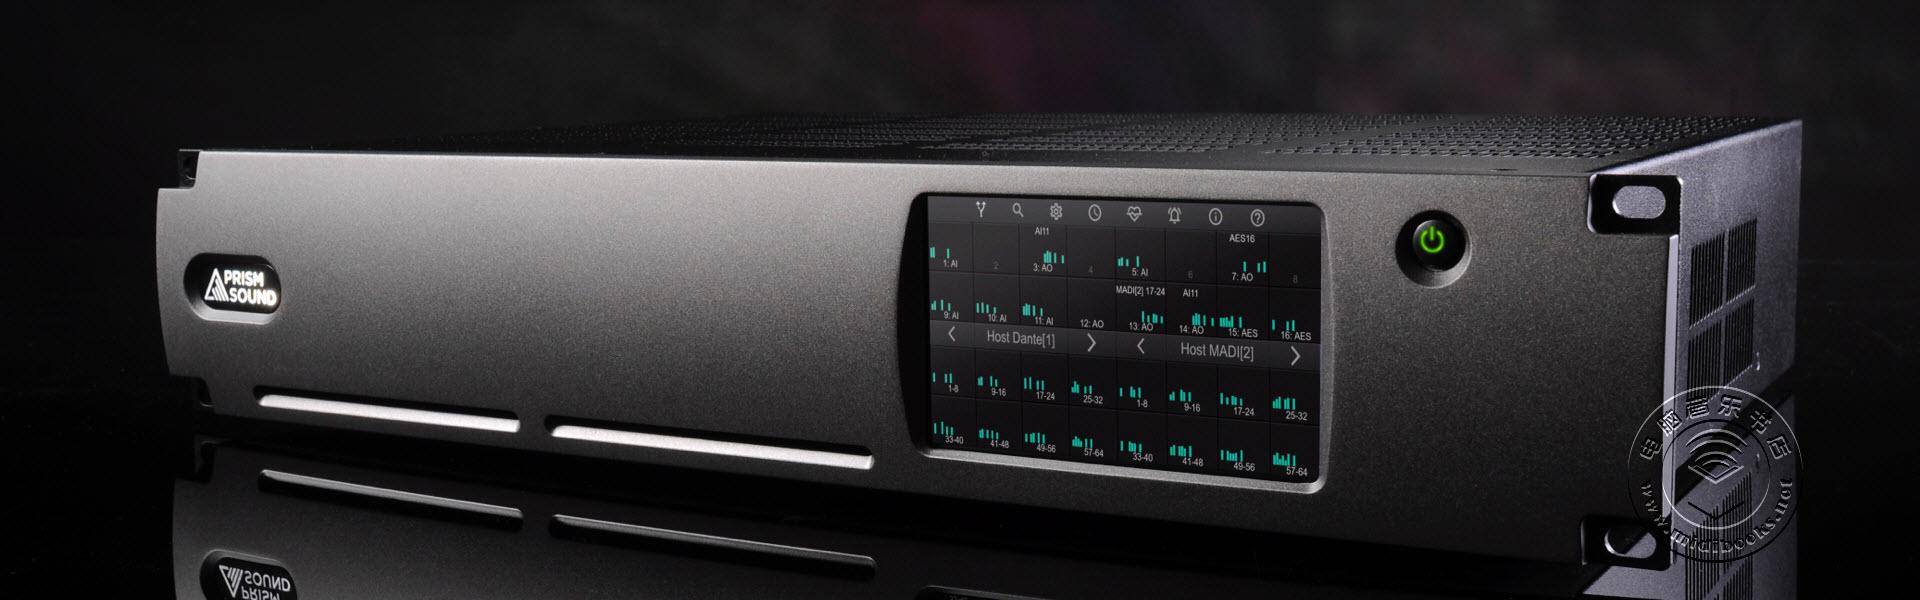 Prism Sound发布128通道高采样率的音频转换器ADA-128